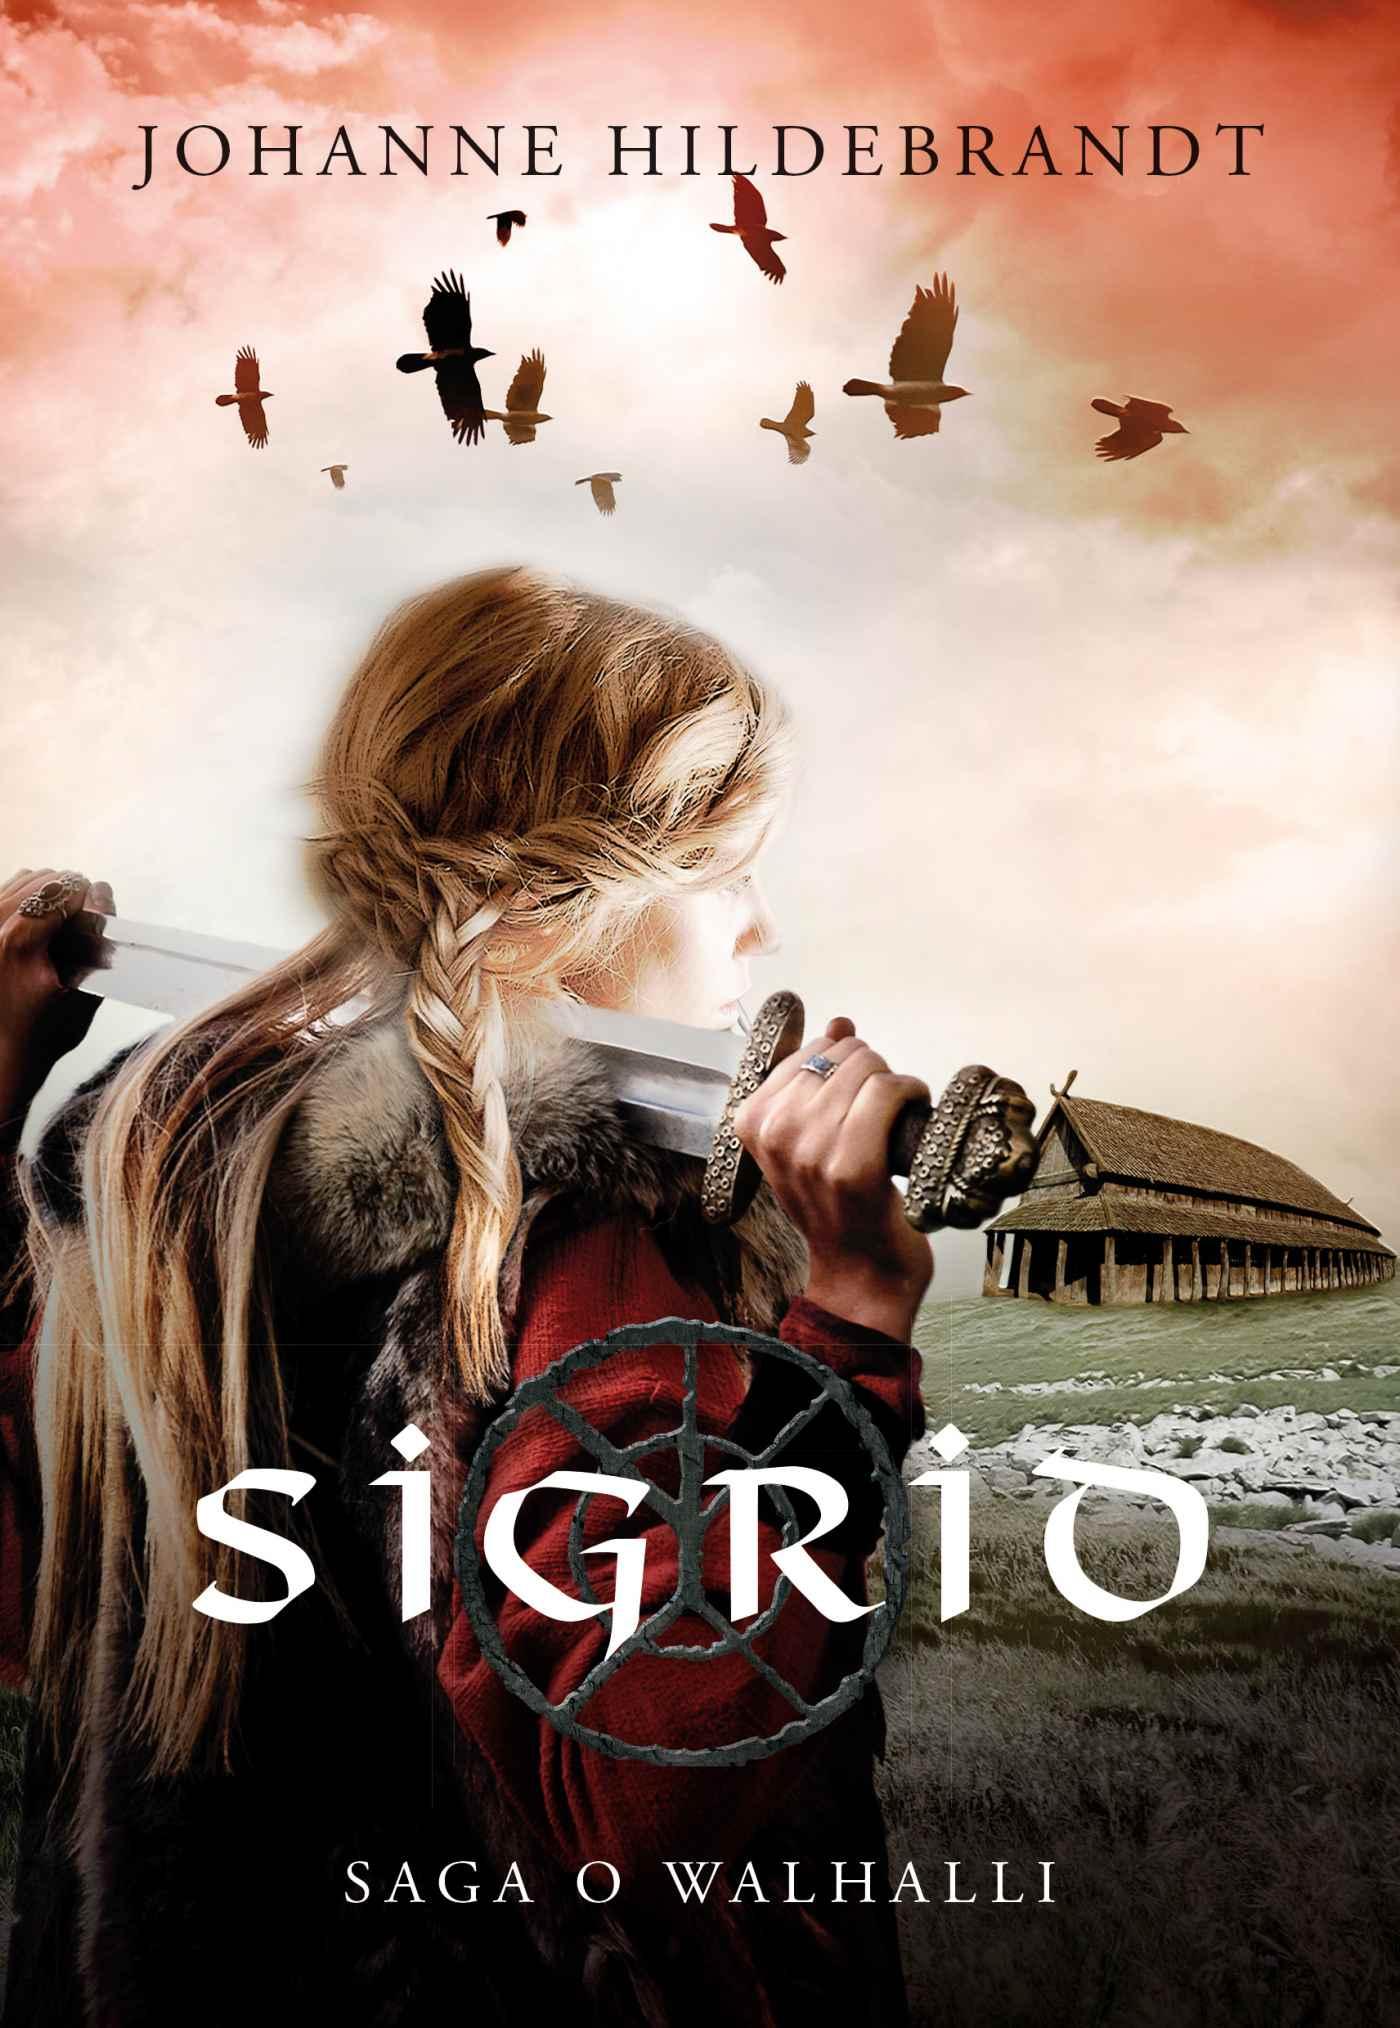 Saga o Walhalli 1. Sigrid - Ebook (Książka na Kindle) do pobrania w formacie MOBI